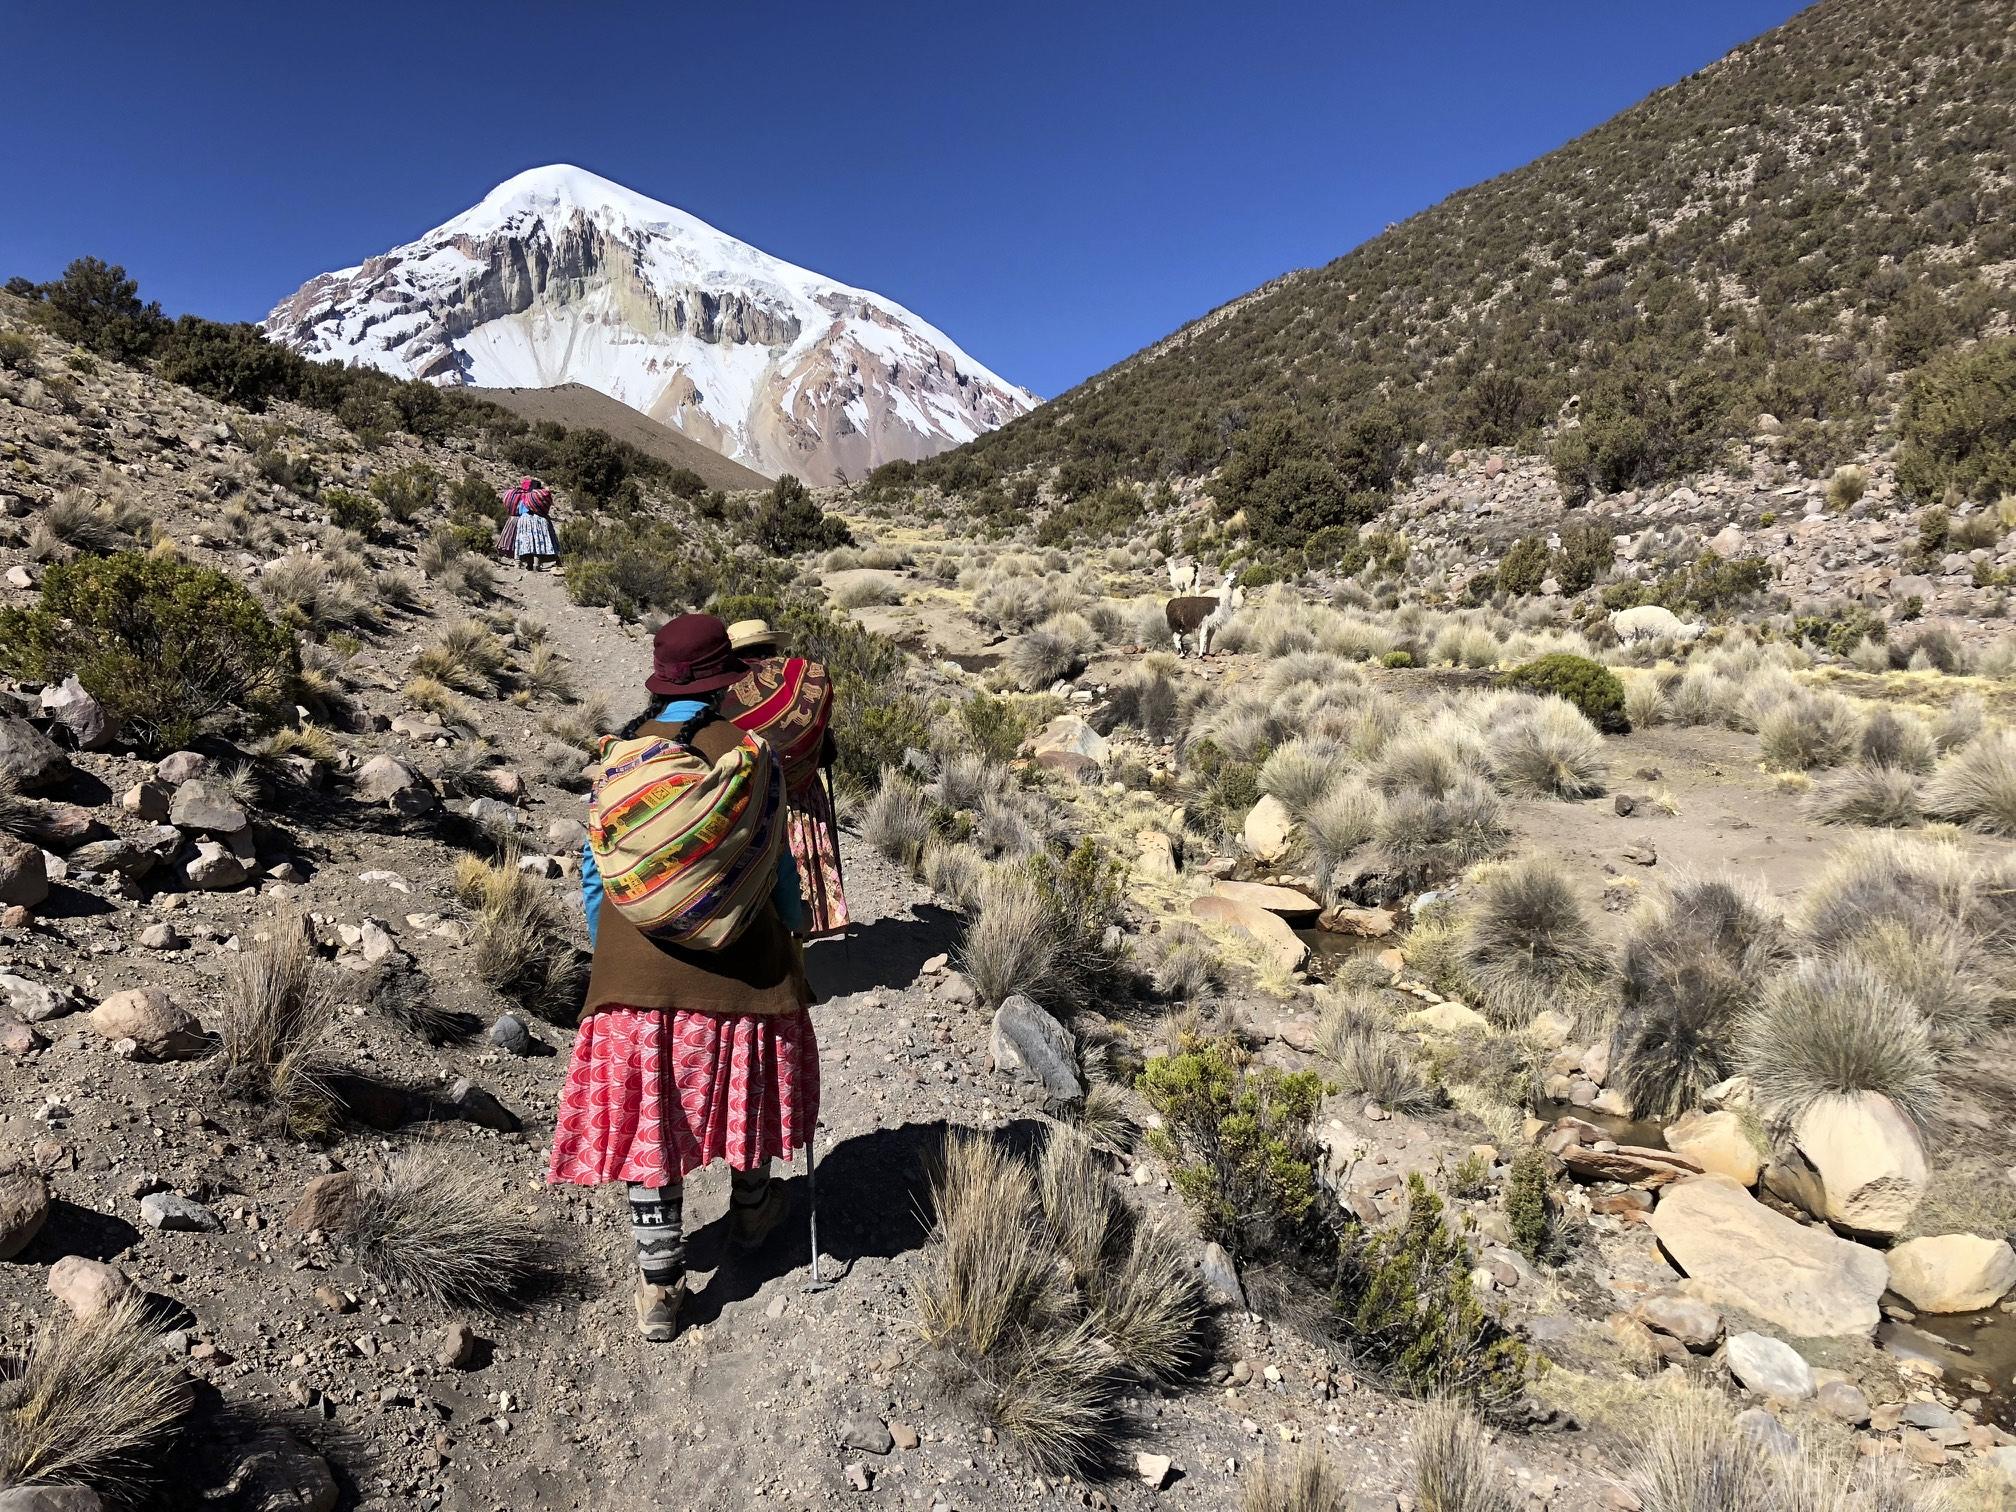 The trail to the BC of Sajama. I met Cholitas Escaladoras who were climbing Sajama.